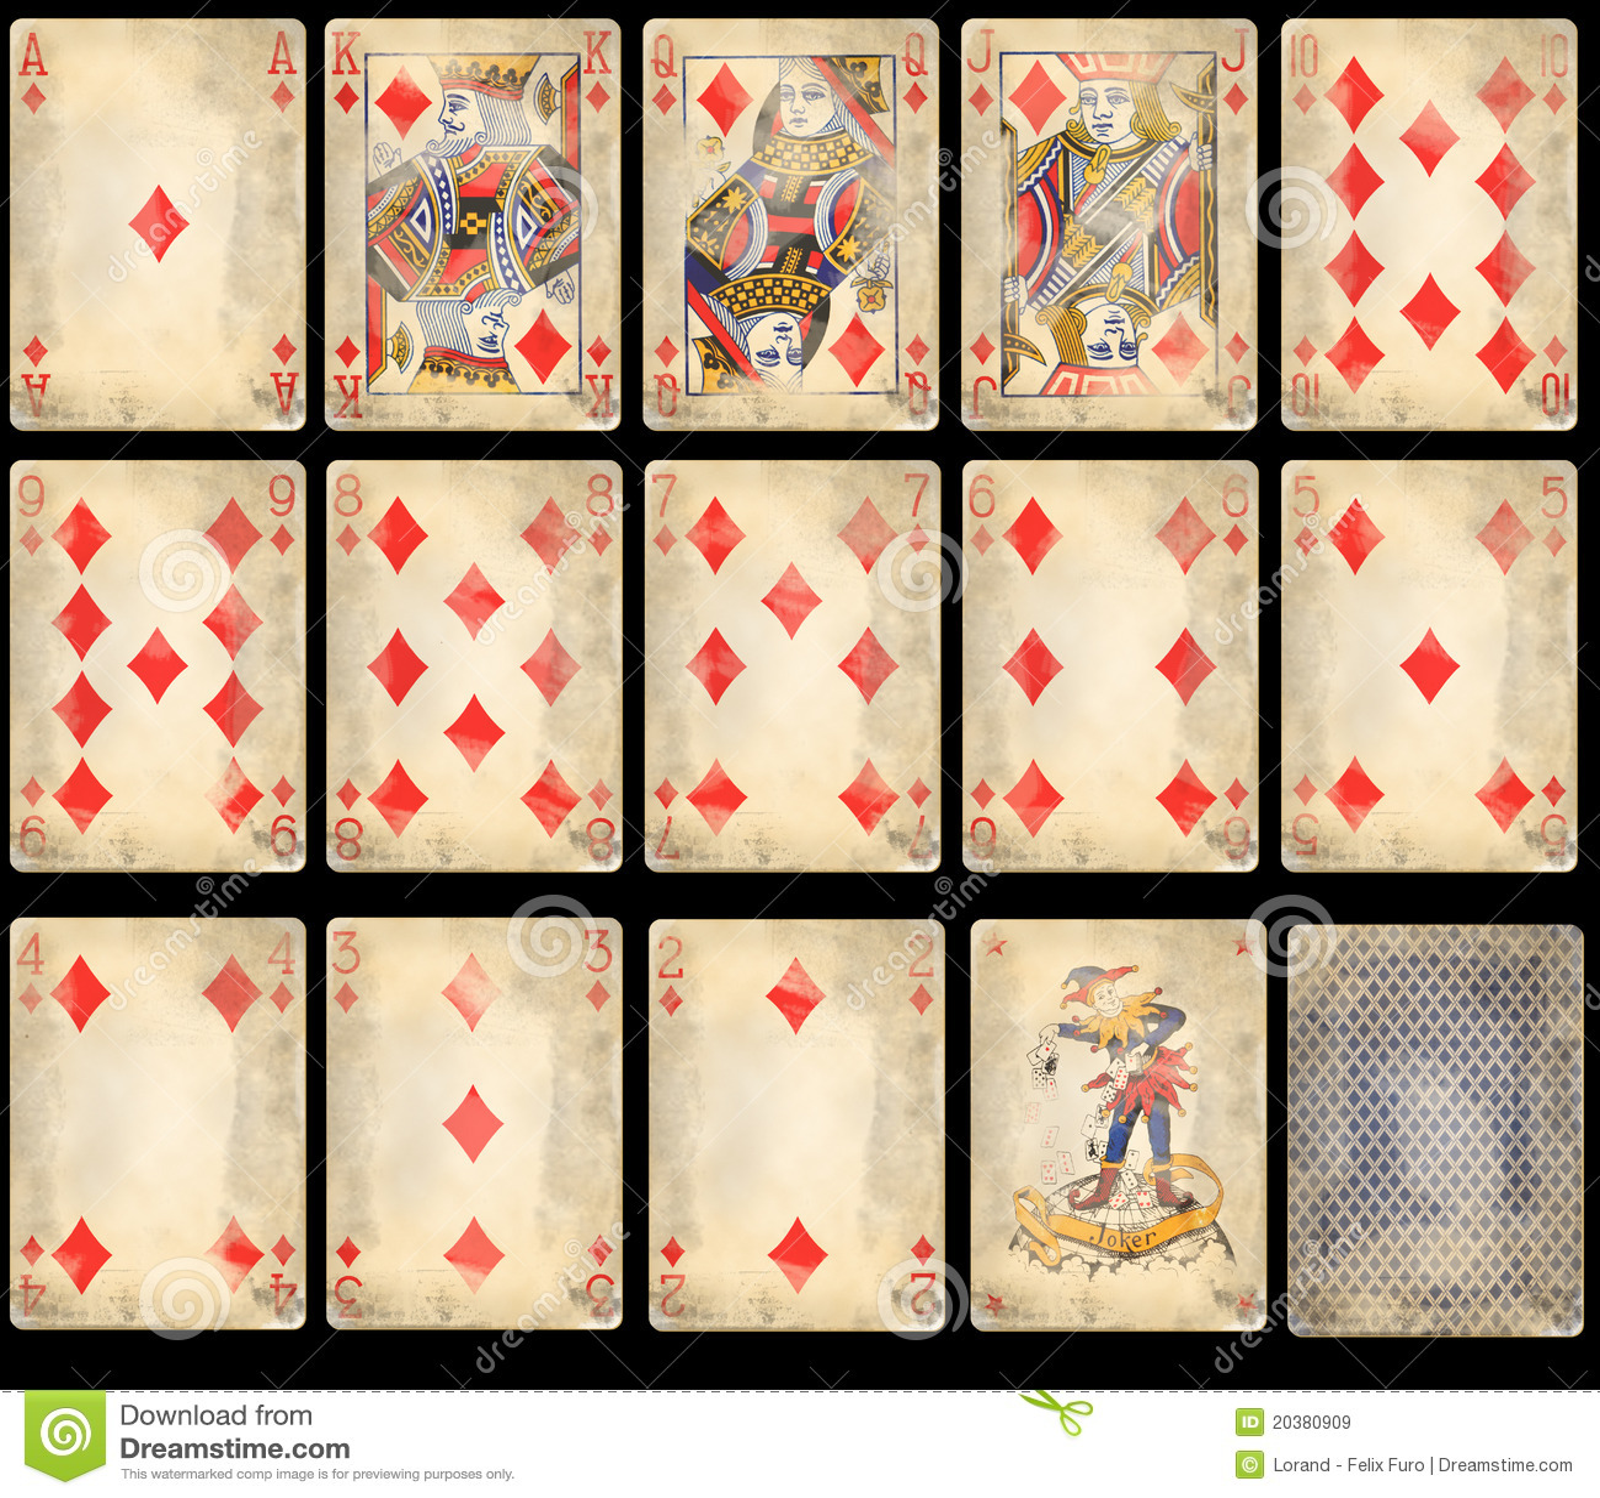 Image Old Fashioned Casino